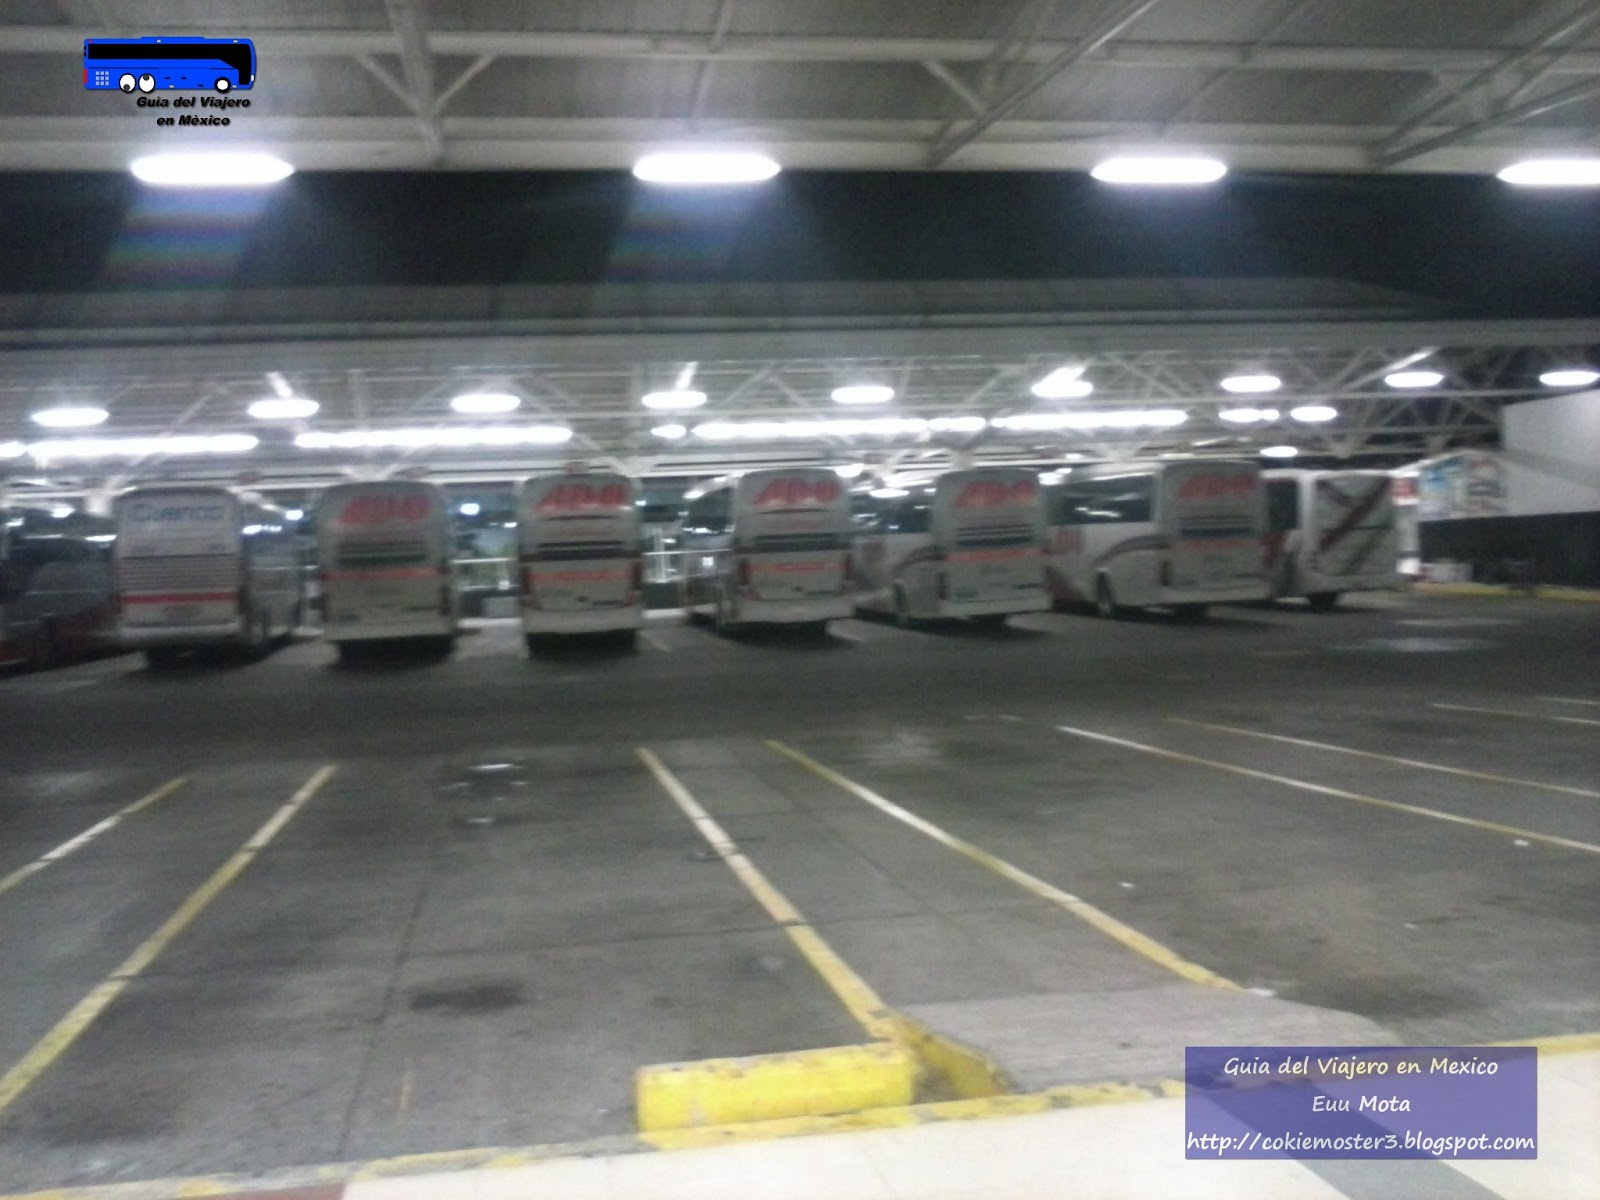 ado piso wifi wiring diagram fan control center relay and transformer guía del viajero en méxico central de autobuses